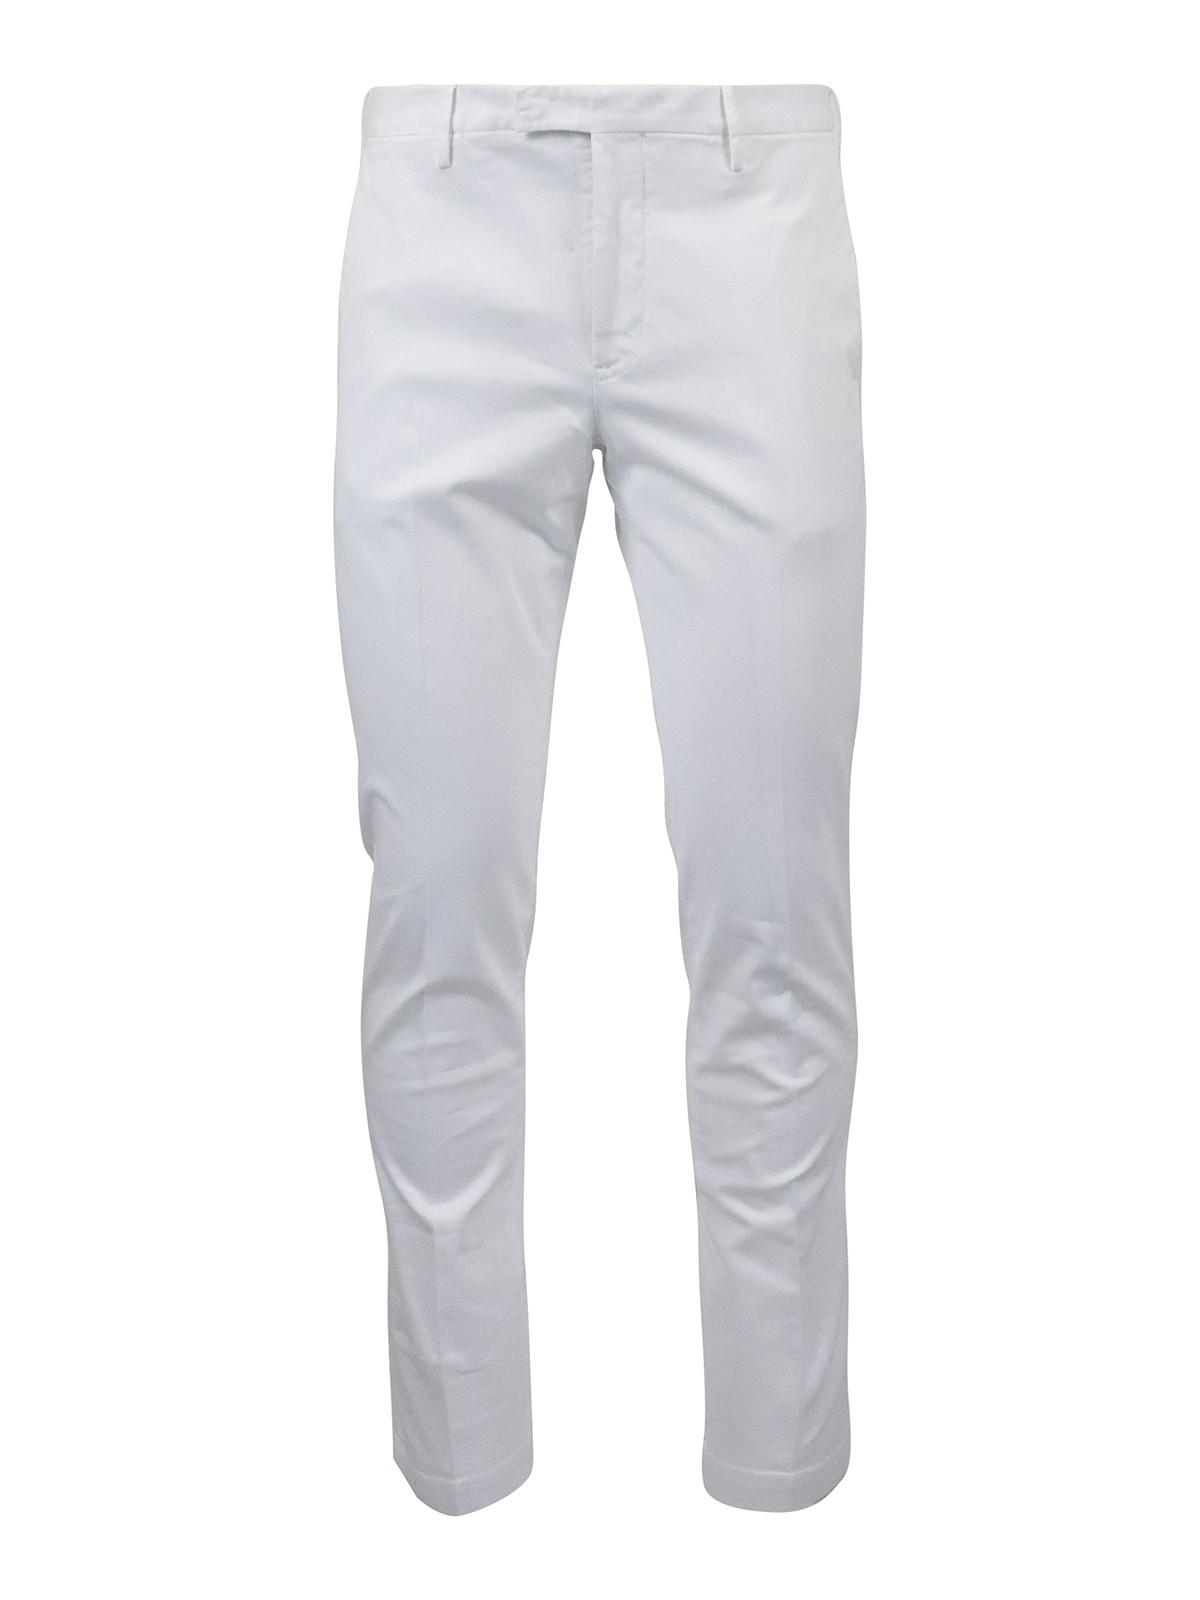 Pt Torino Stretch Cotton Pants In White